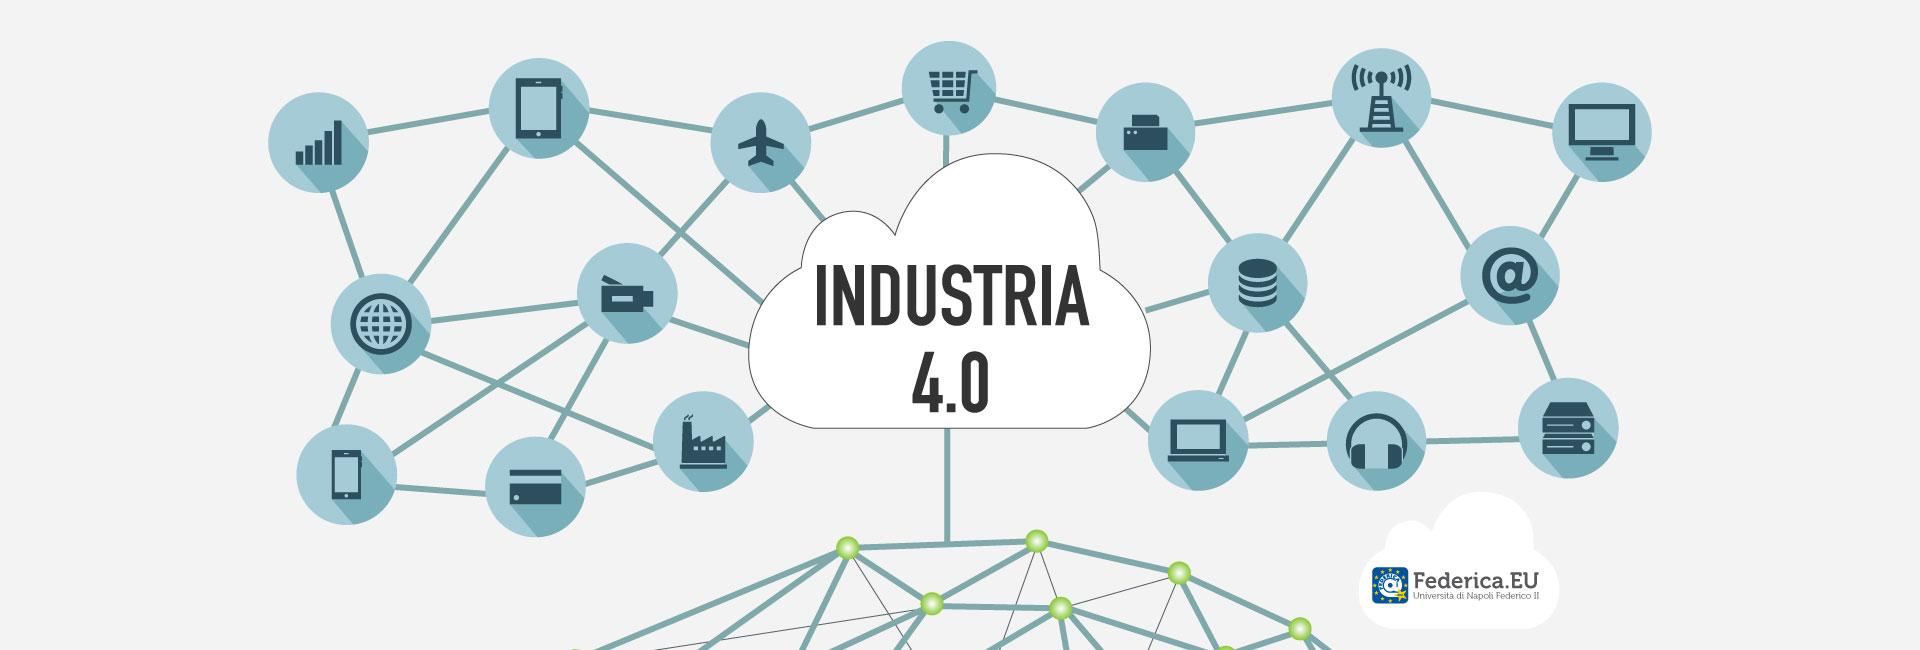 Banner Industria 4.0 - Federica.EU